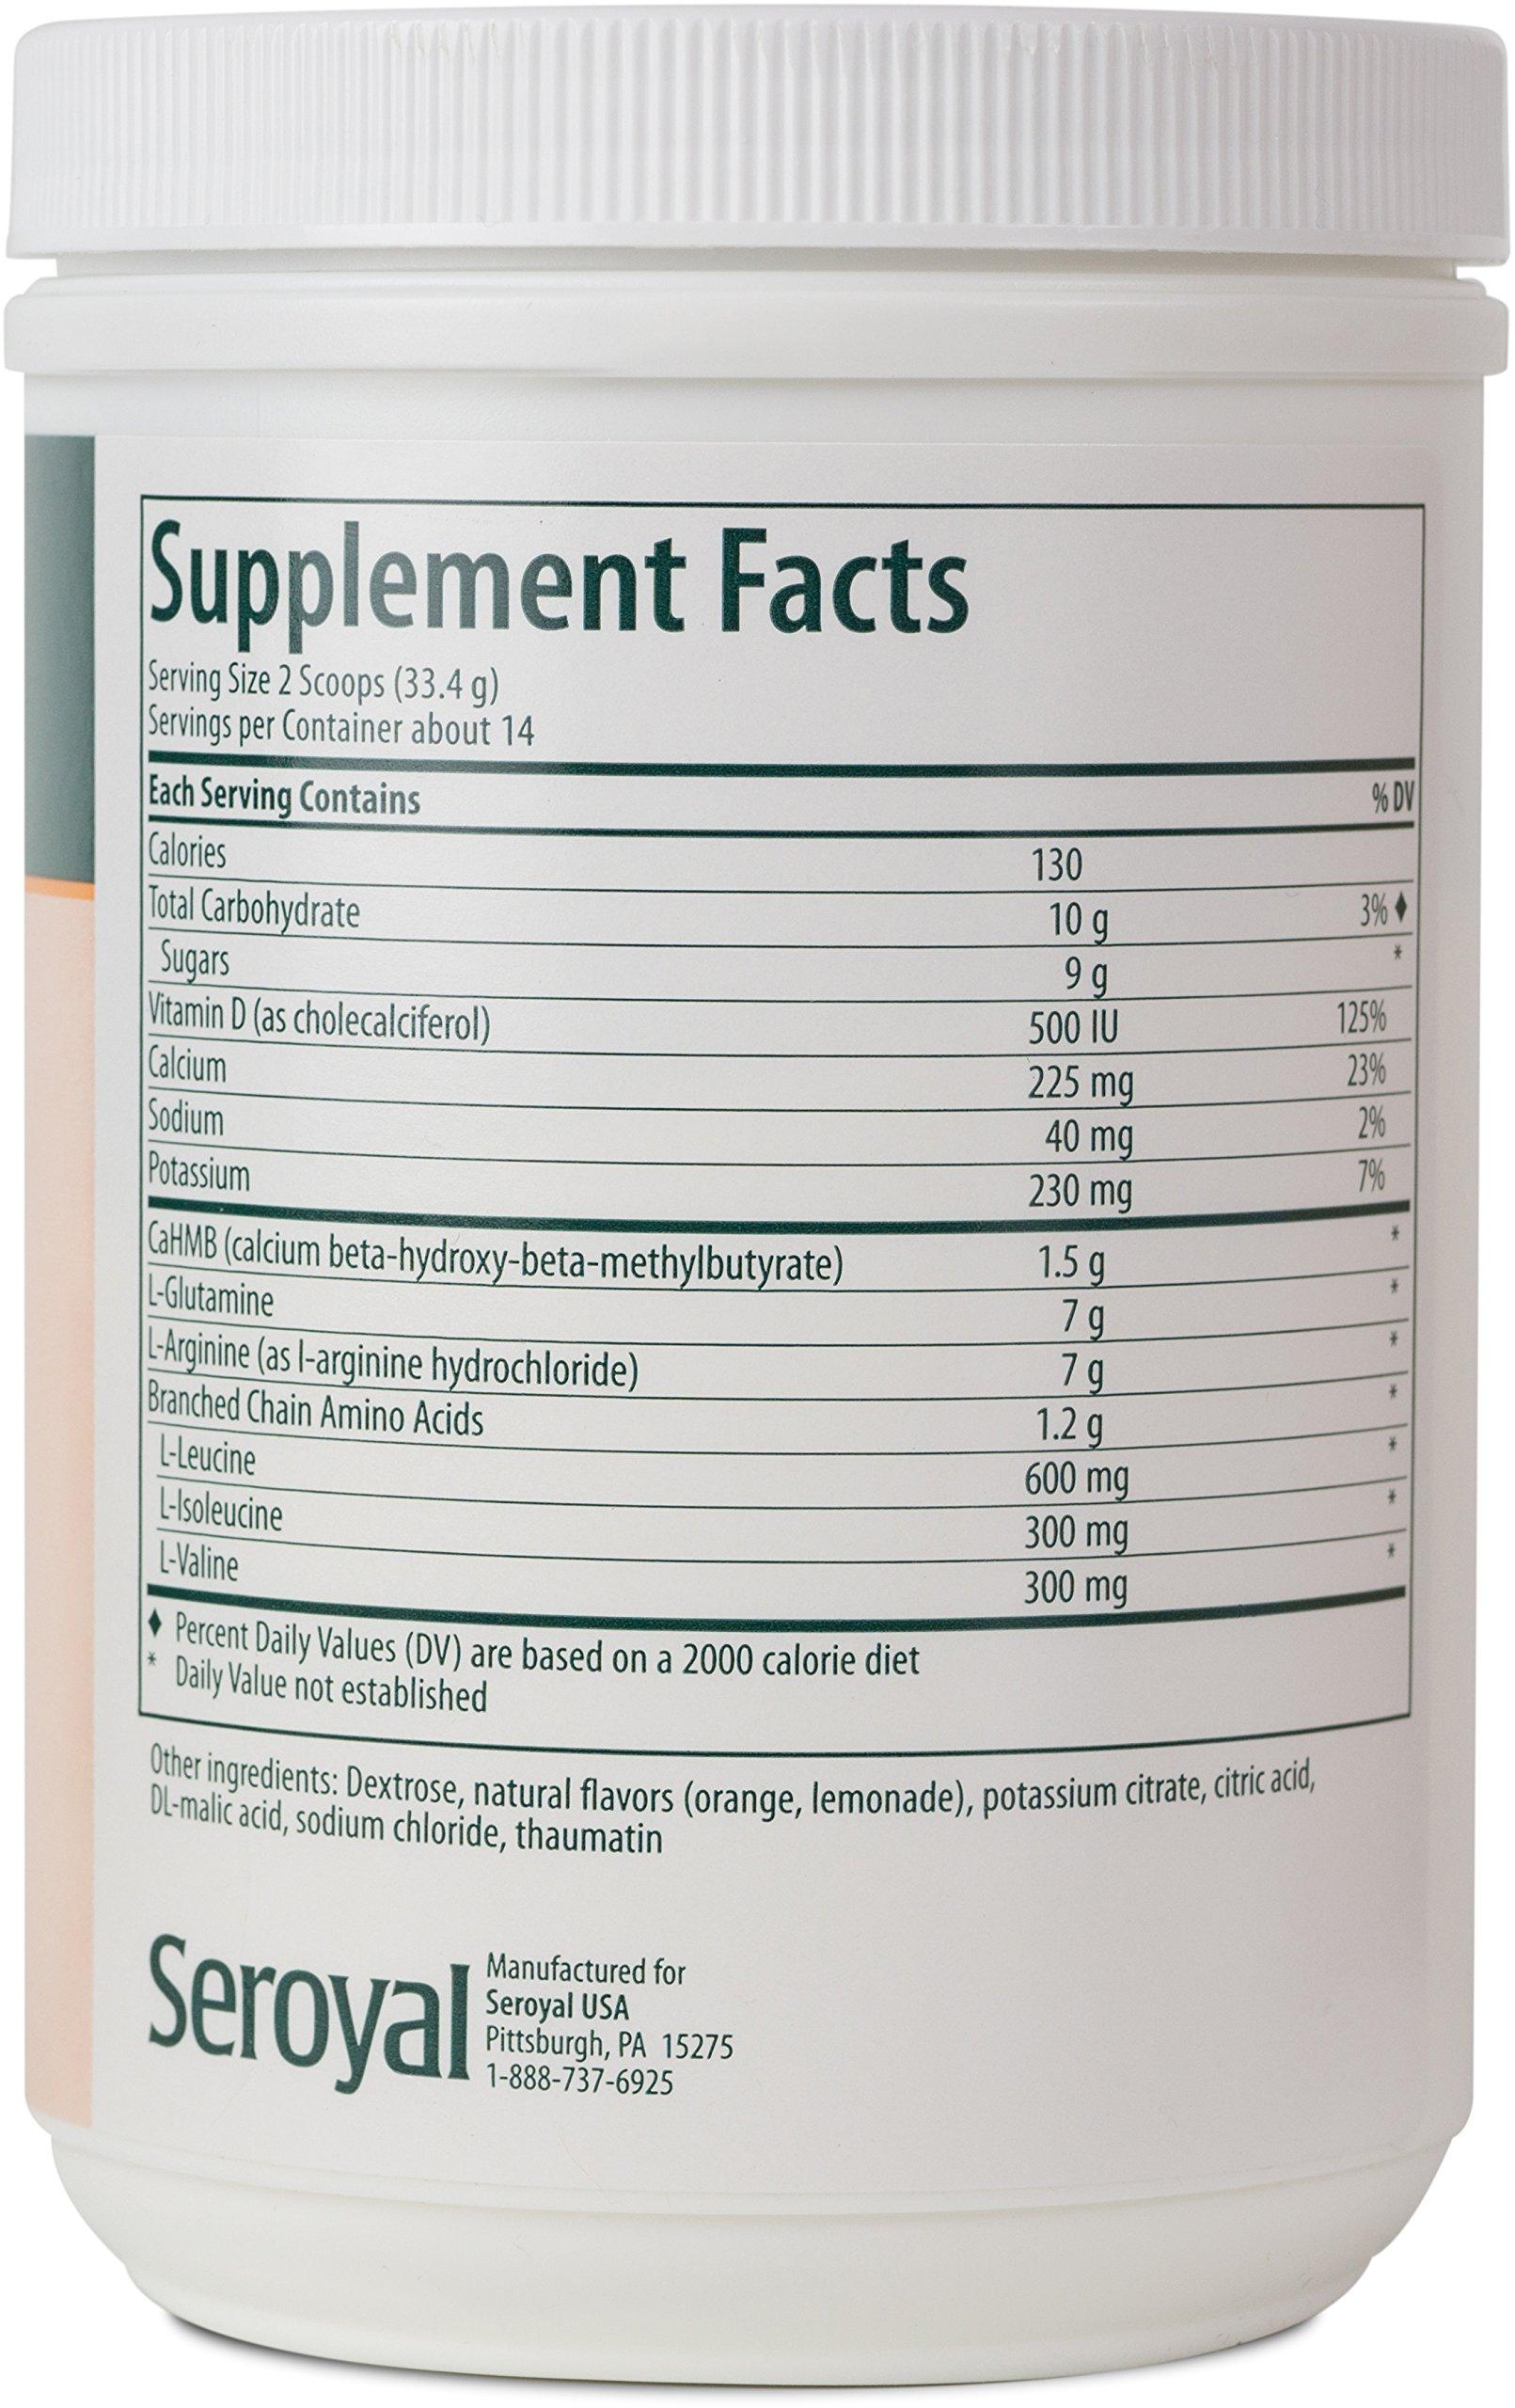 Genestra Brands - HMB Complex - Vegetarian Amino Acid Powder Supplement - Natural Orange Flavor - 16.6 oz (470 g) by Genestra Brands (Image #2)